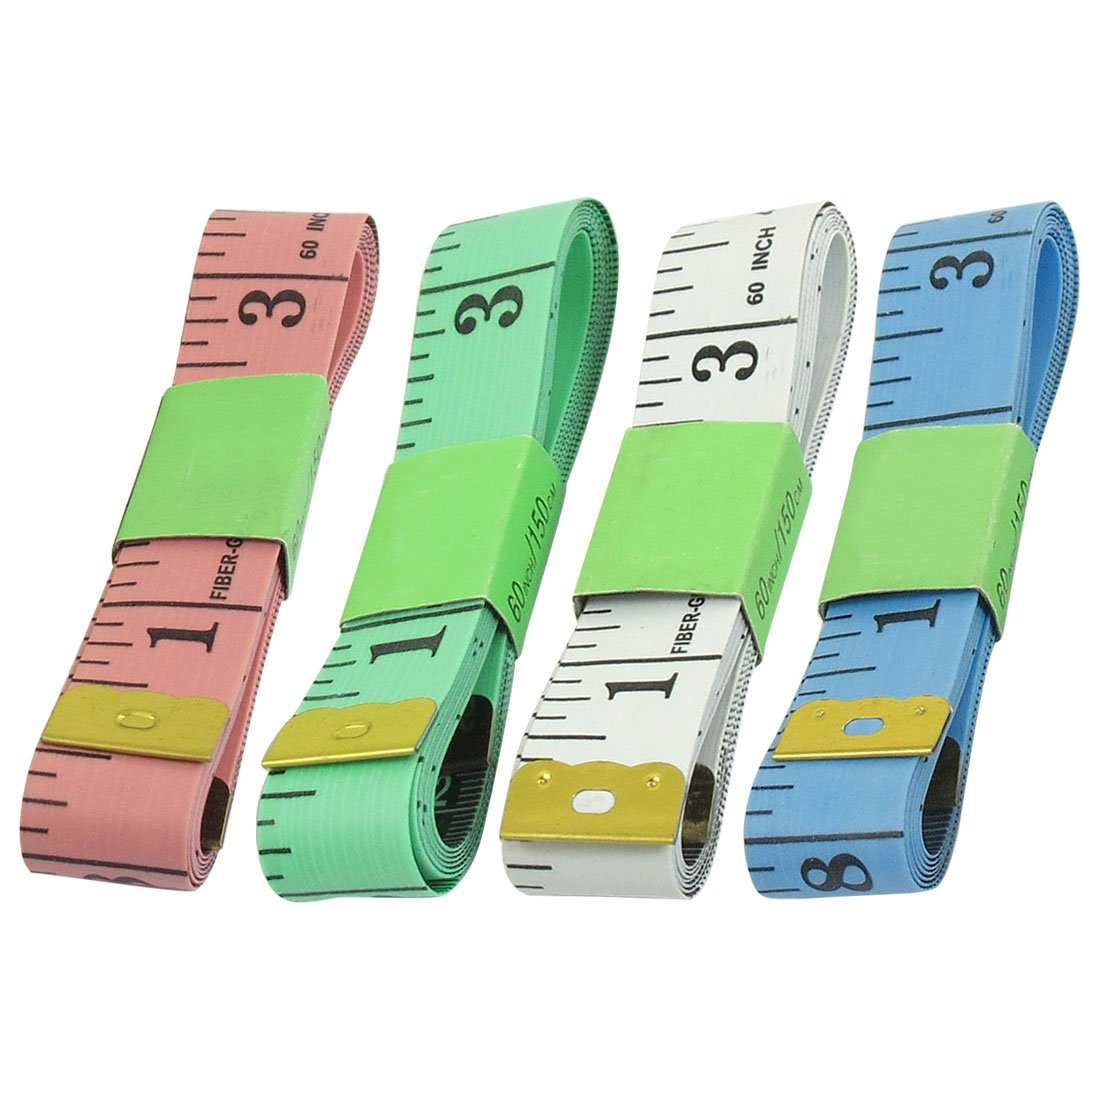 4 piezas 152, 4 cm 1, 5 m varios colores suave costurera regla de costura gamuza de fibra de vidrio Sourcingmap a13030500ux0322